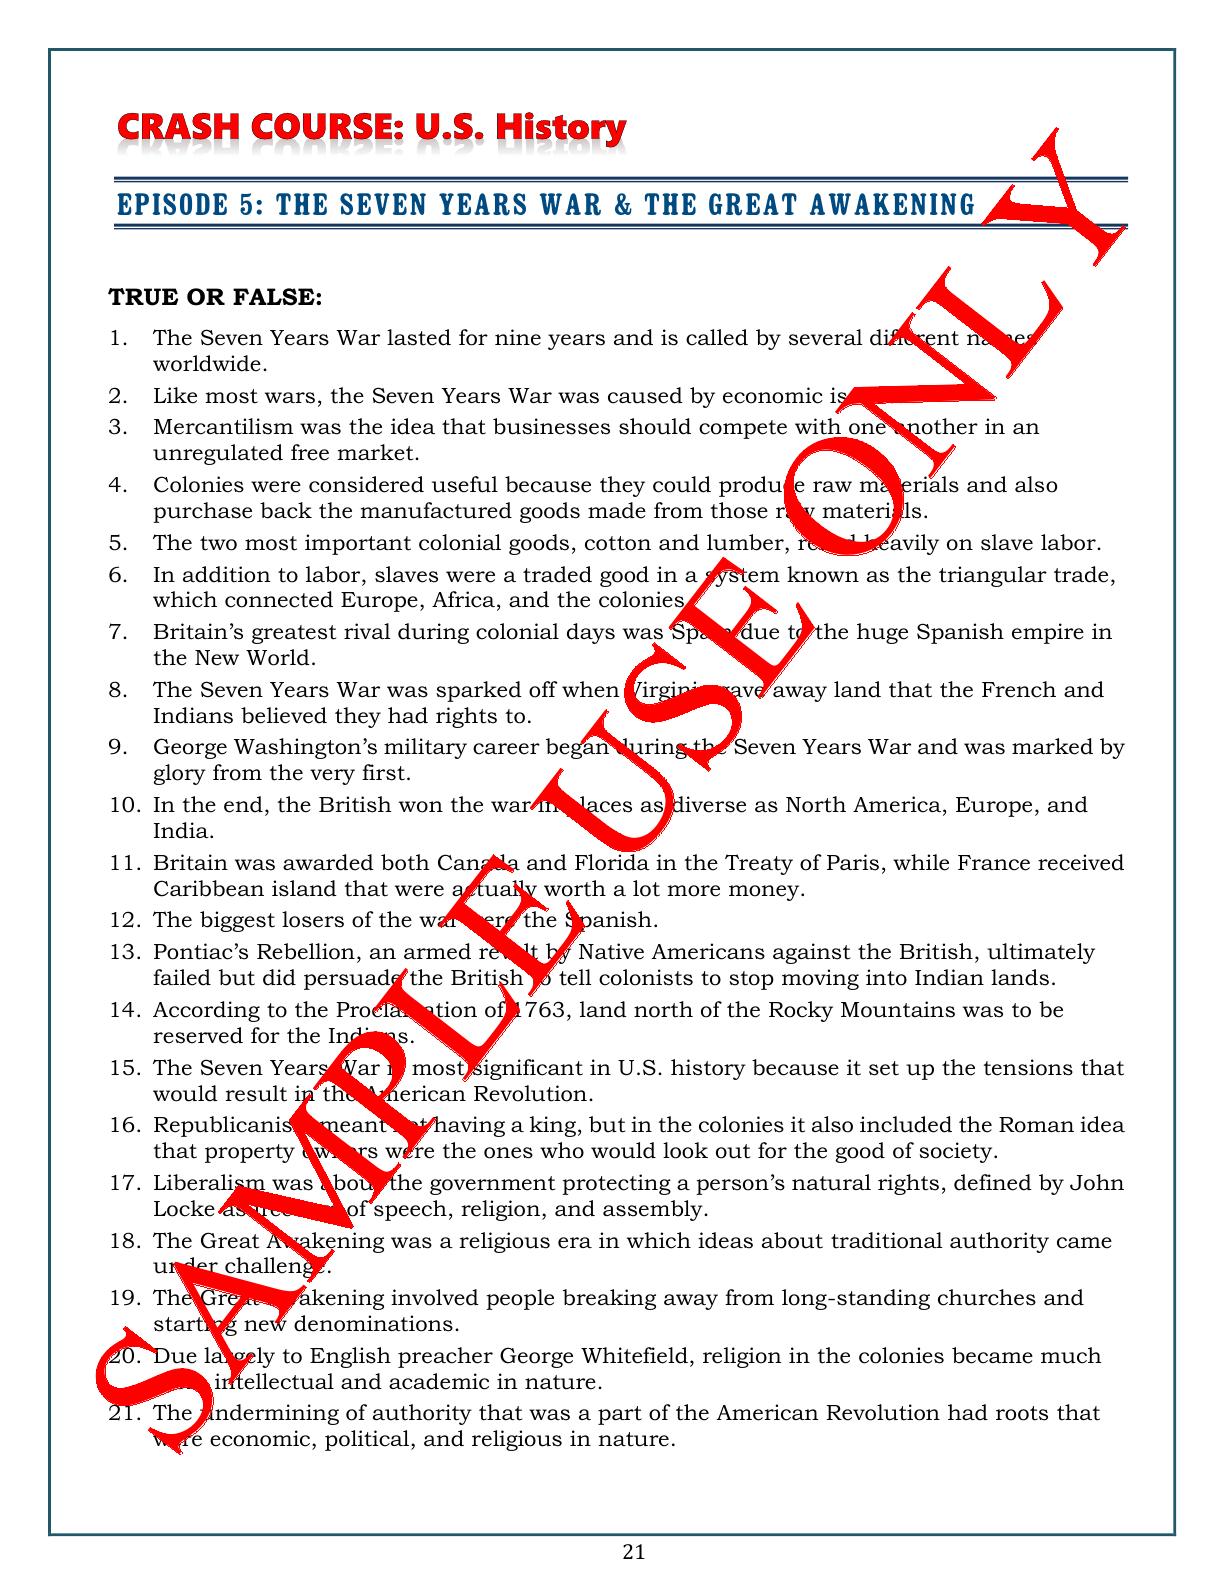 medium resolution of DISTANCE LEARNING Crash Course U.S. History Worksheets: Episodes 1-5 BUNDLE    History worksheets